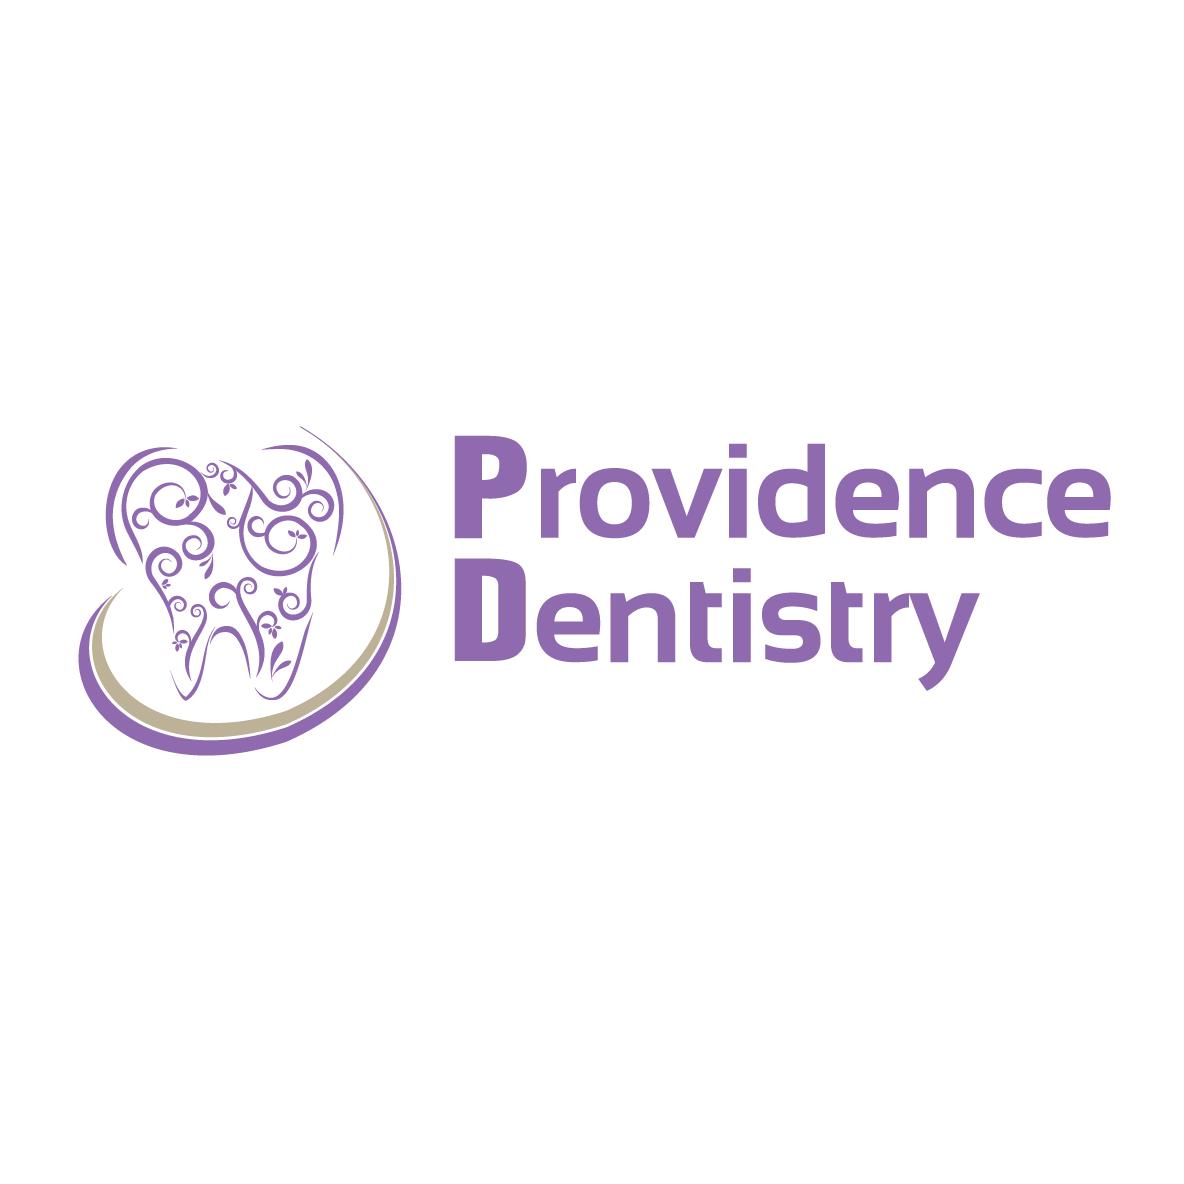 Providence Dentistry